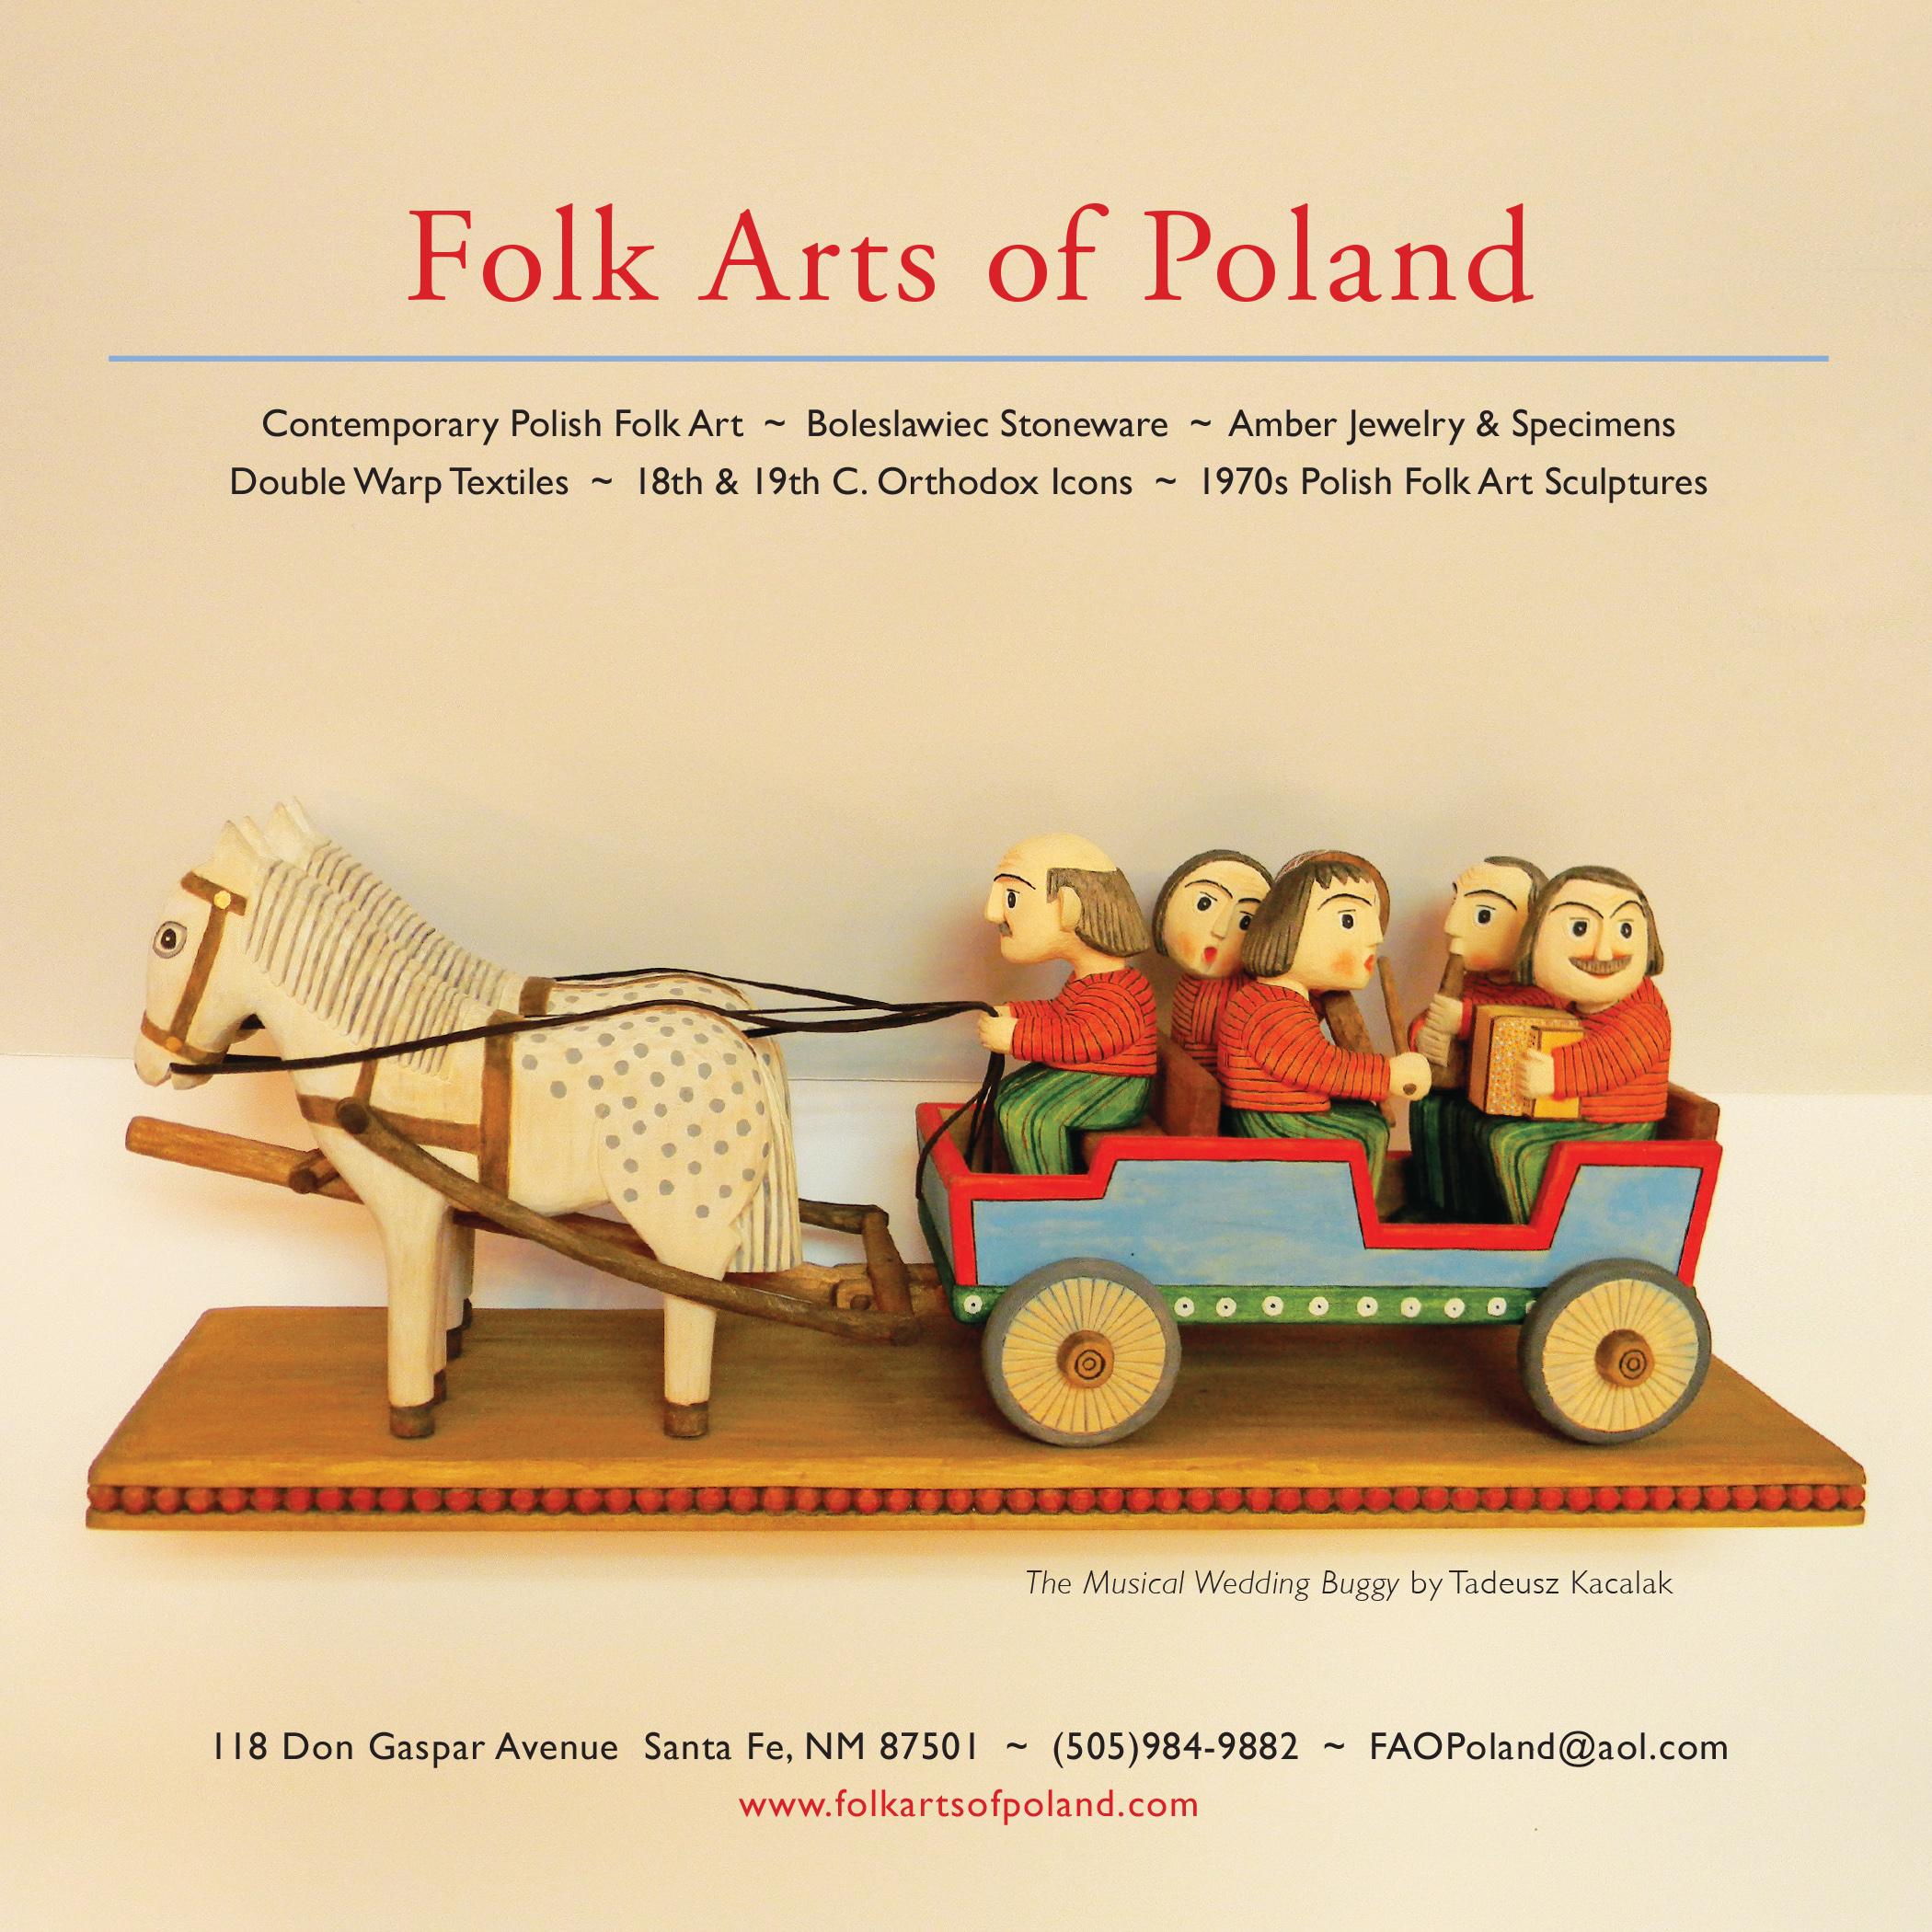 FolkArtsofPoland-EG-SFT-2017-18-Ad.jpg